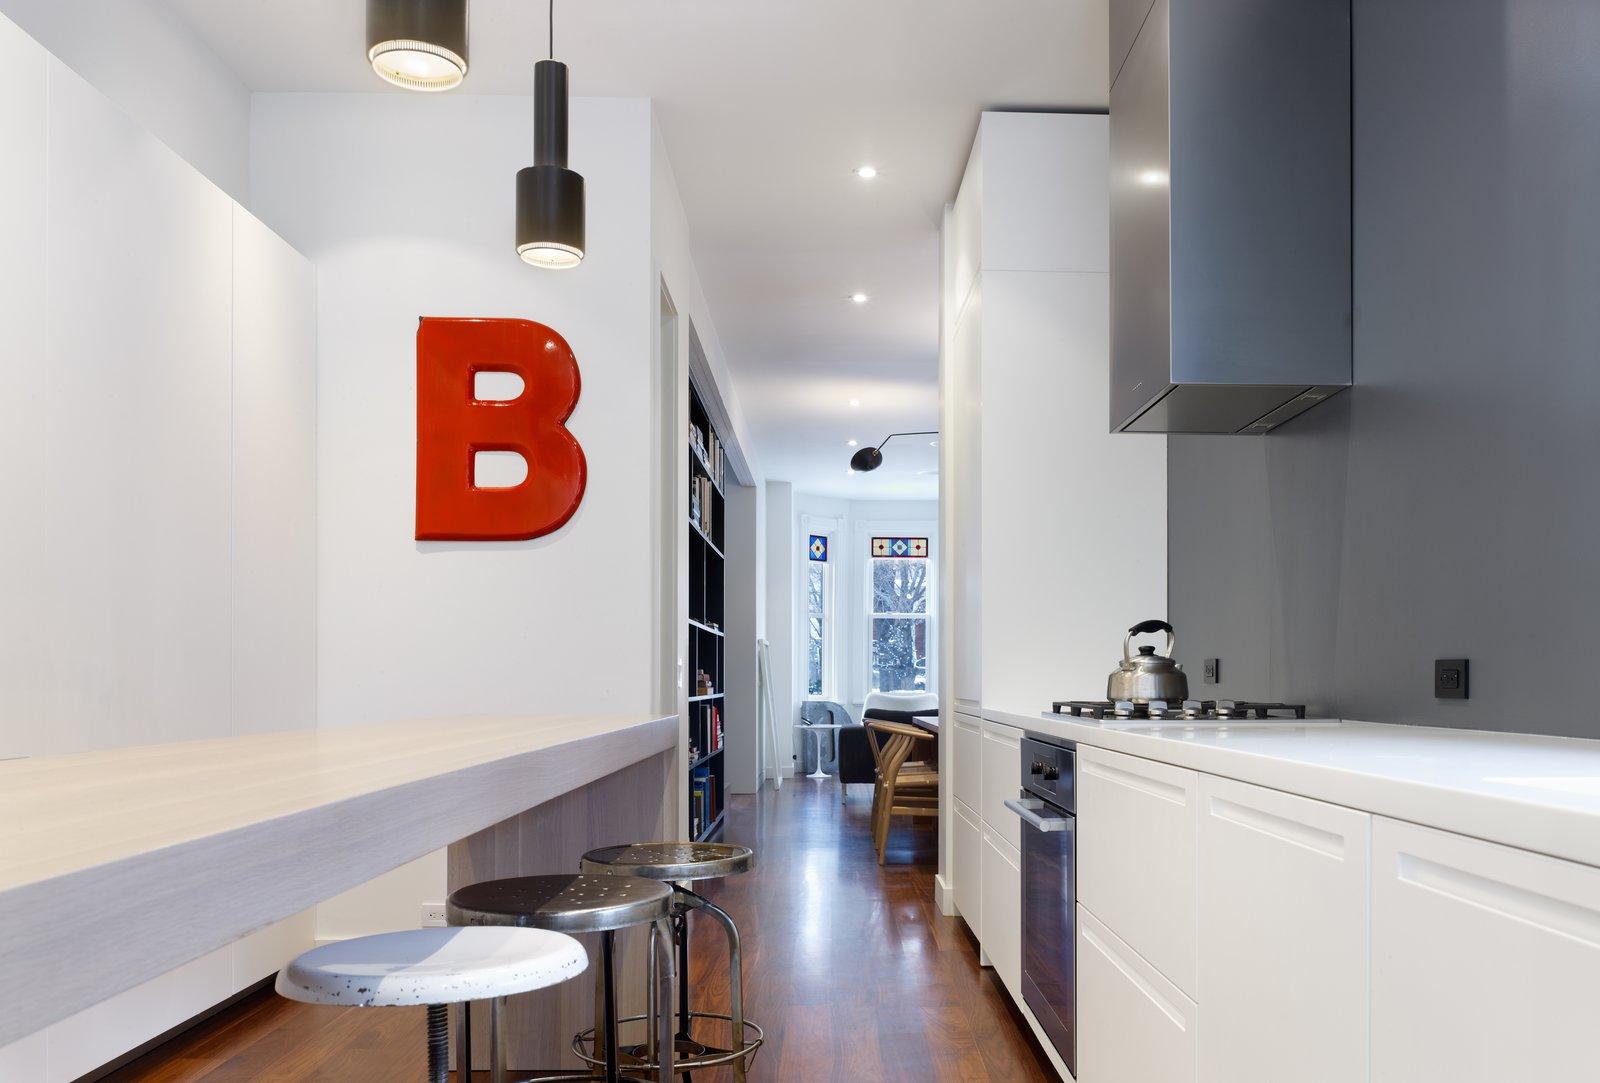 Kitchen, Recessed Lighting, White Cabinet, Range Hood, Cooktops, Range, Pendant Lighting, and Medium Hardwood Floor  Contrast House